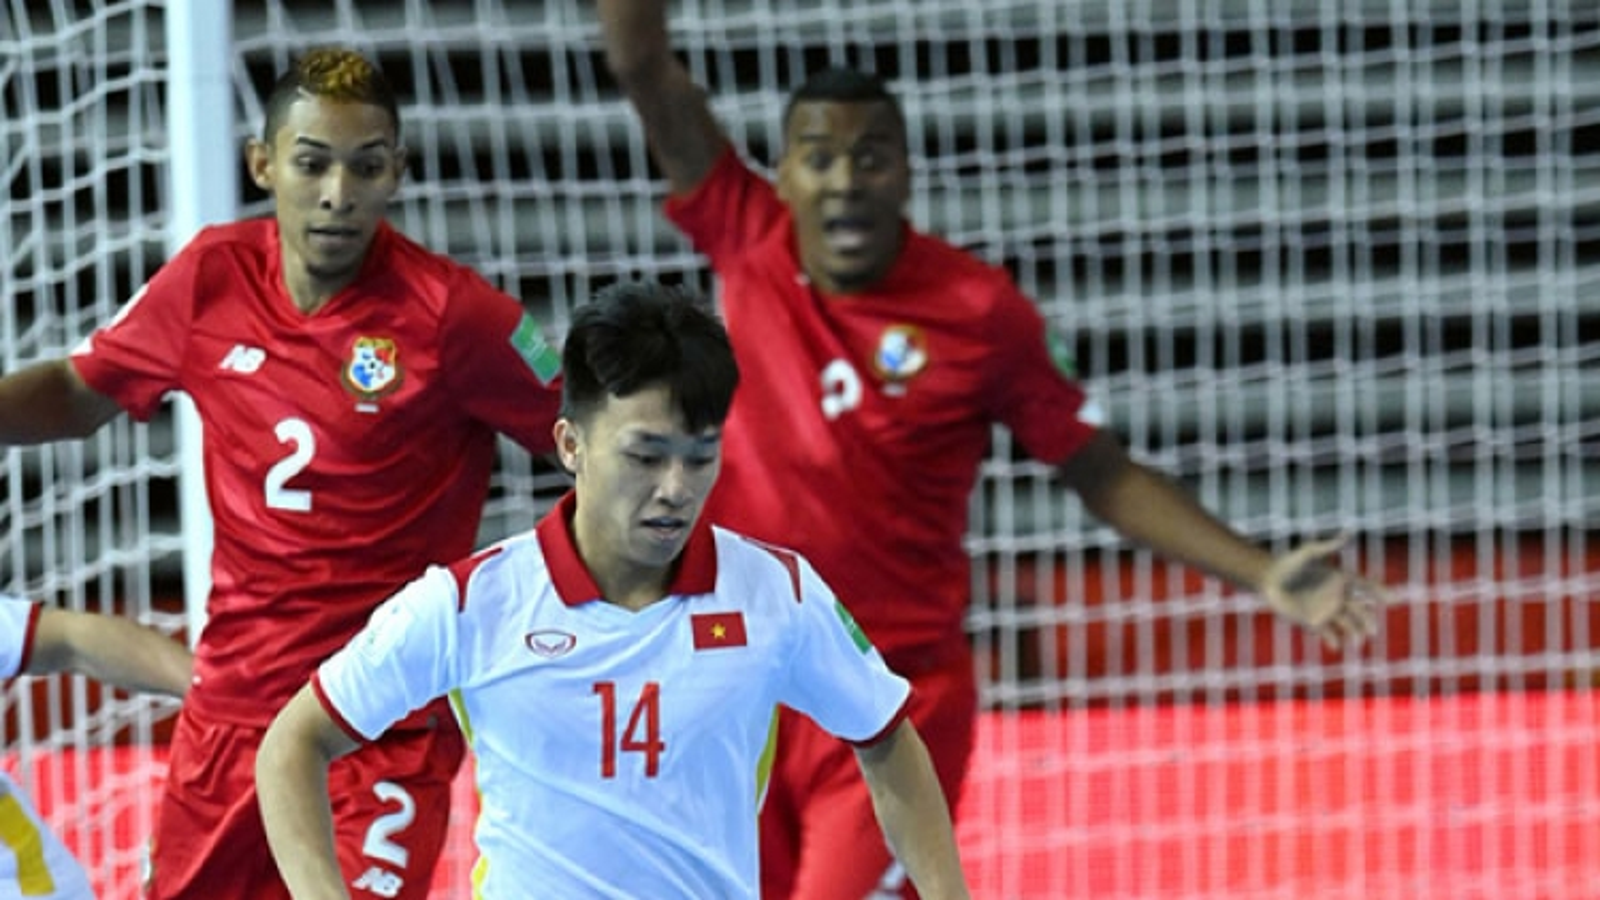 Van Hieu wins Goal of the Tournament at FIFA Futsal World Cup